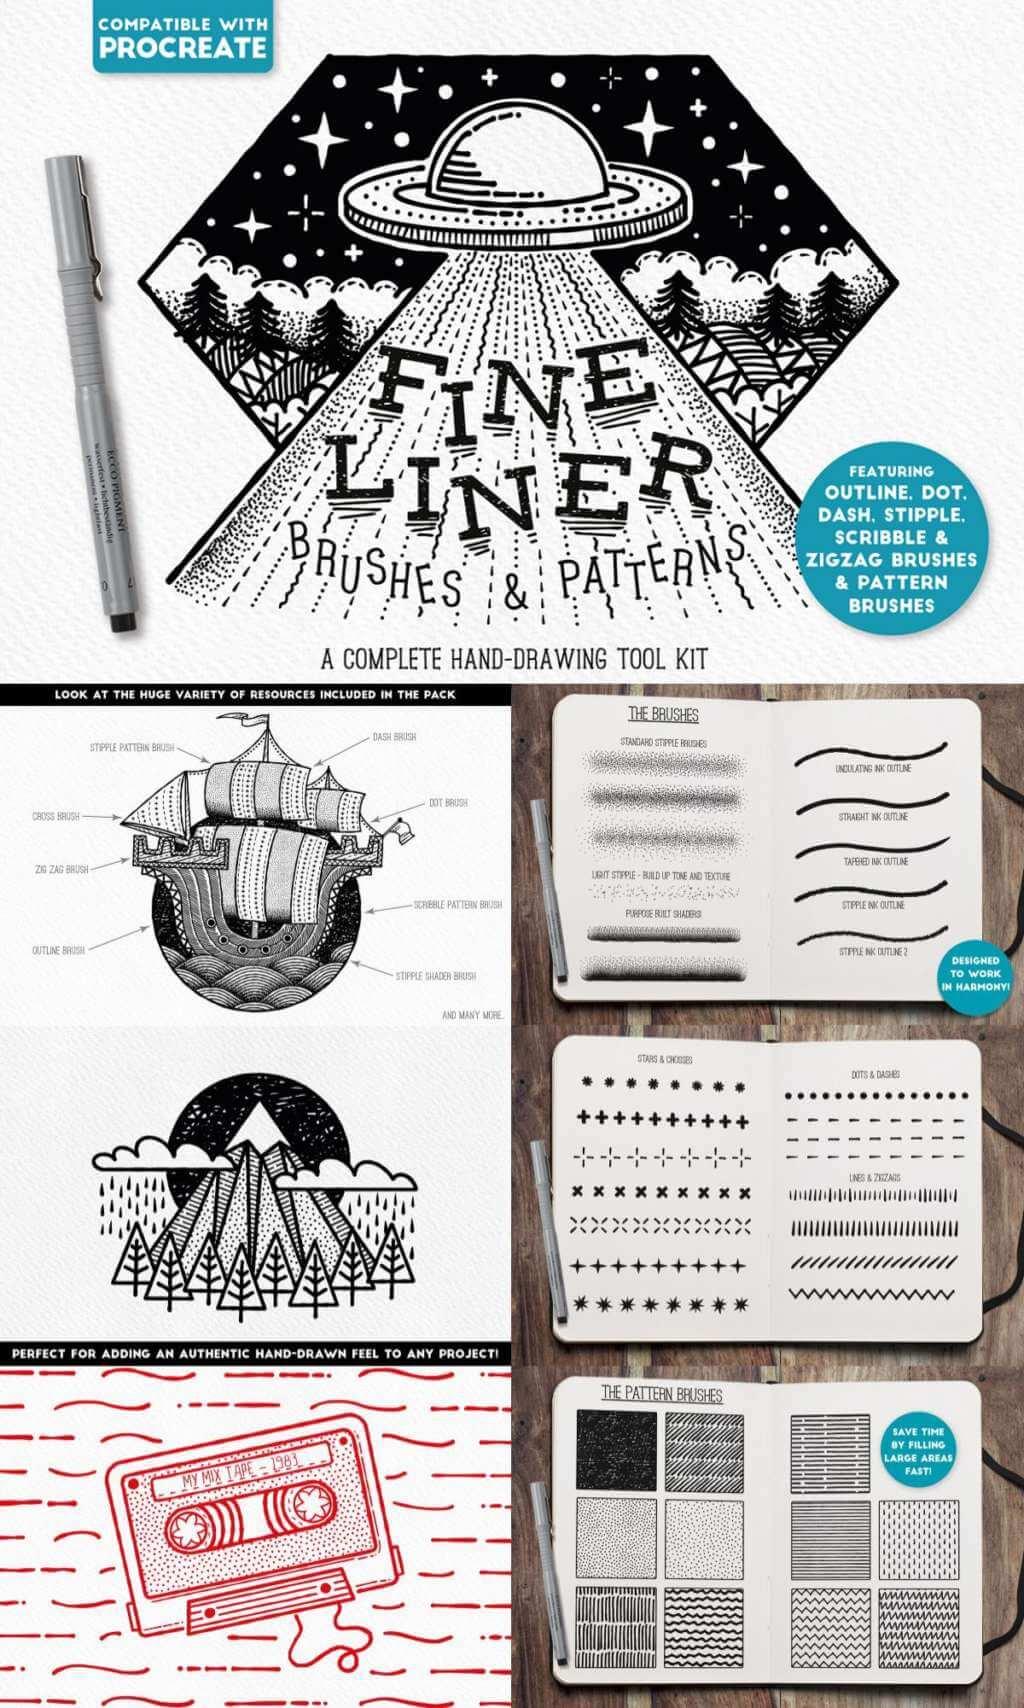 FINE LINER BRUSHES & PATTERNS – PROCREATE